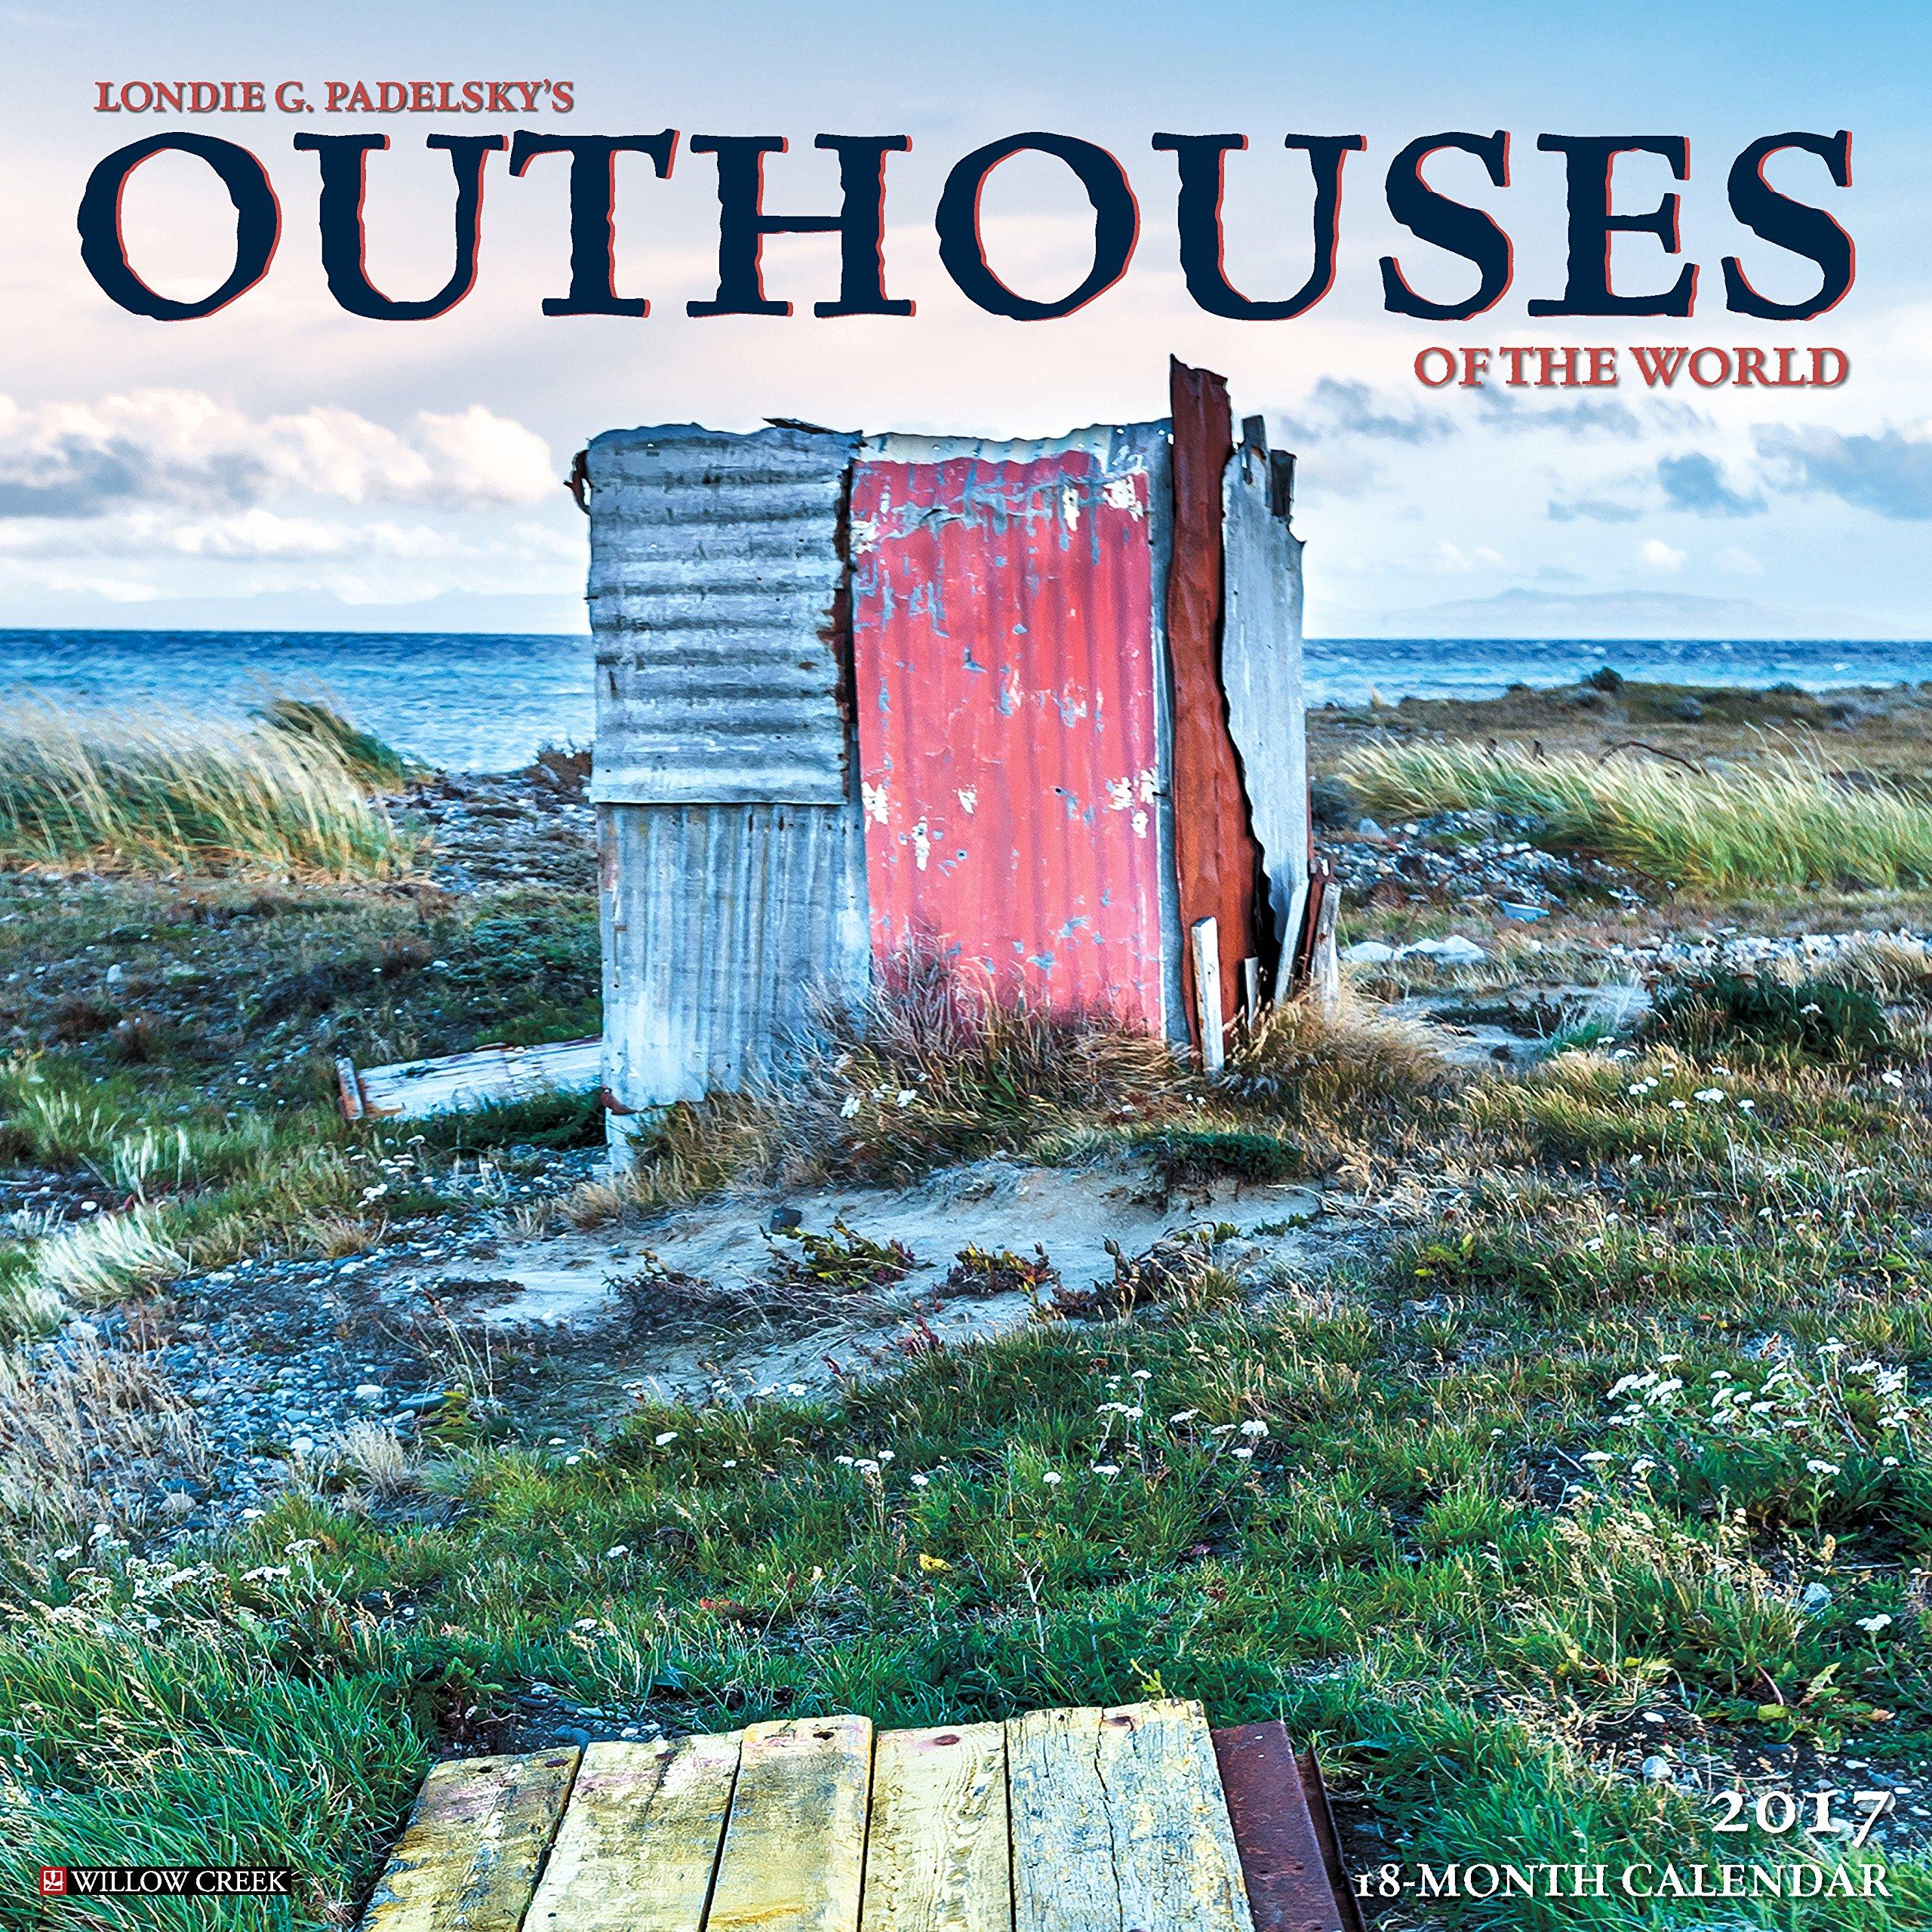 Outhouses 2017 Wall Calendar: Willow Creek Press: 9781682341599:  Amazon.com: Books